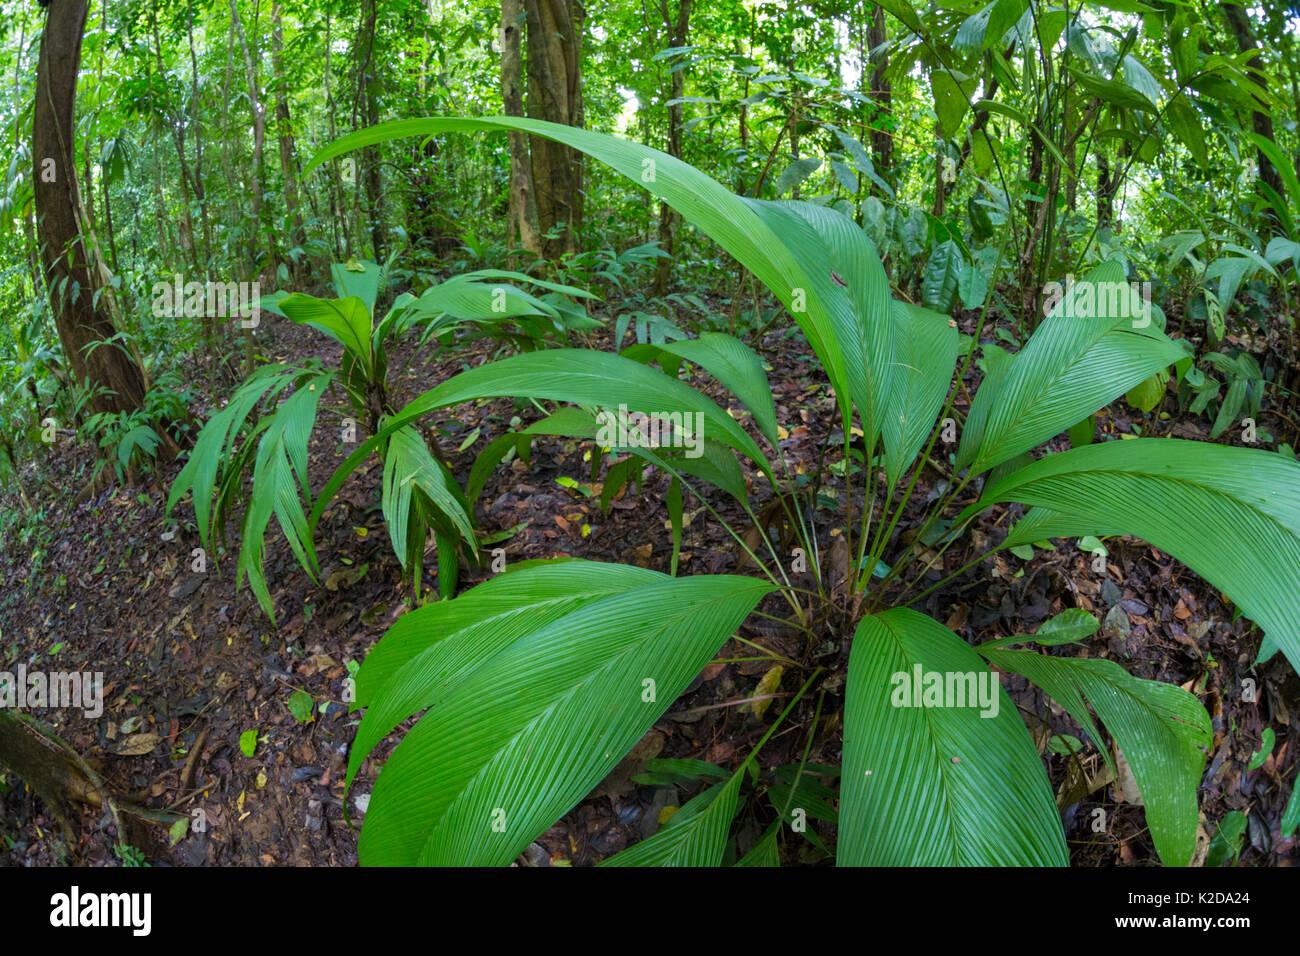 Lowland Tropical Rainforest Understory Vegetation